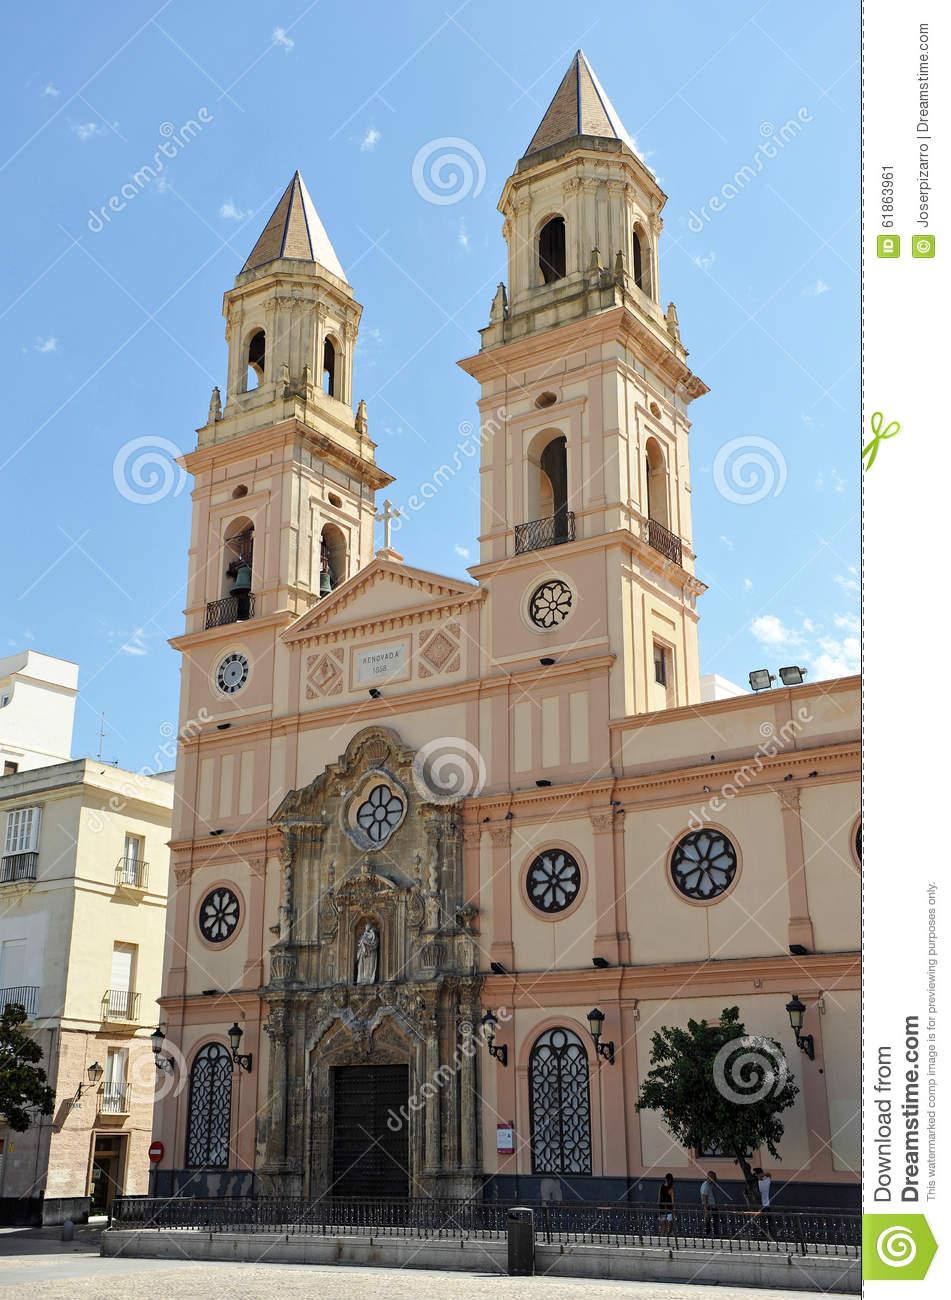 The Saint Anthony Church, Cadiz, Andalusia, Spain Stock Photo.